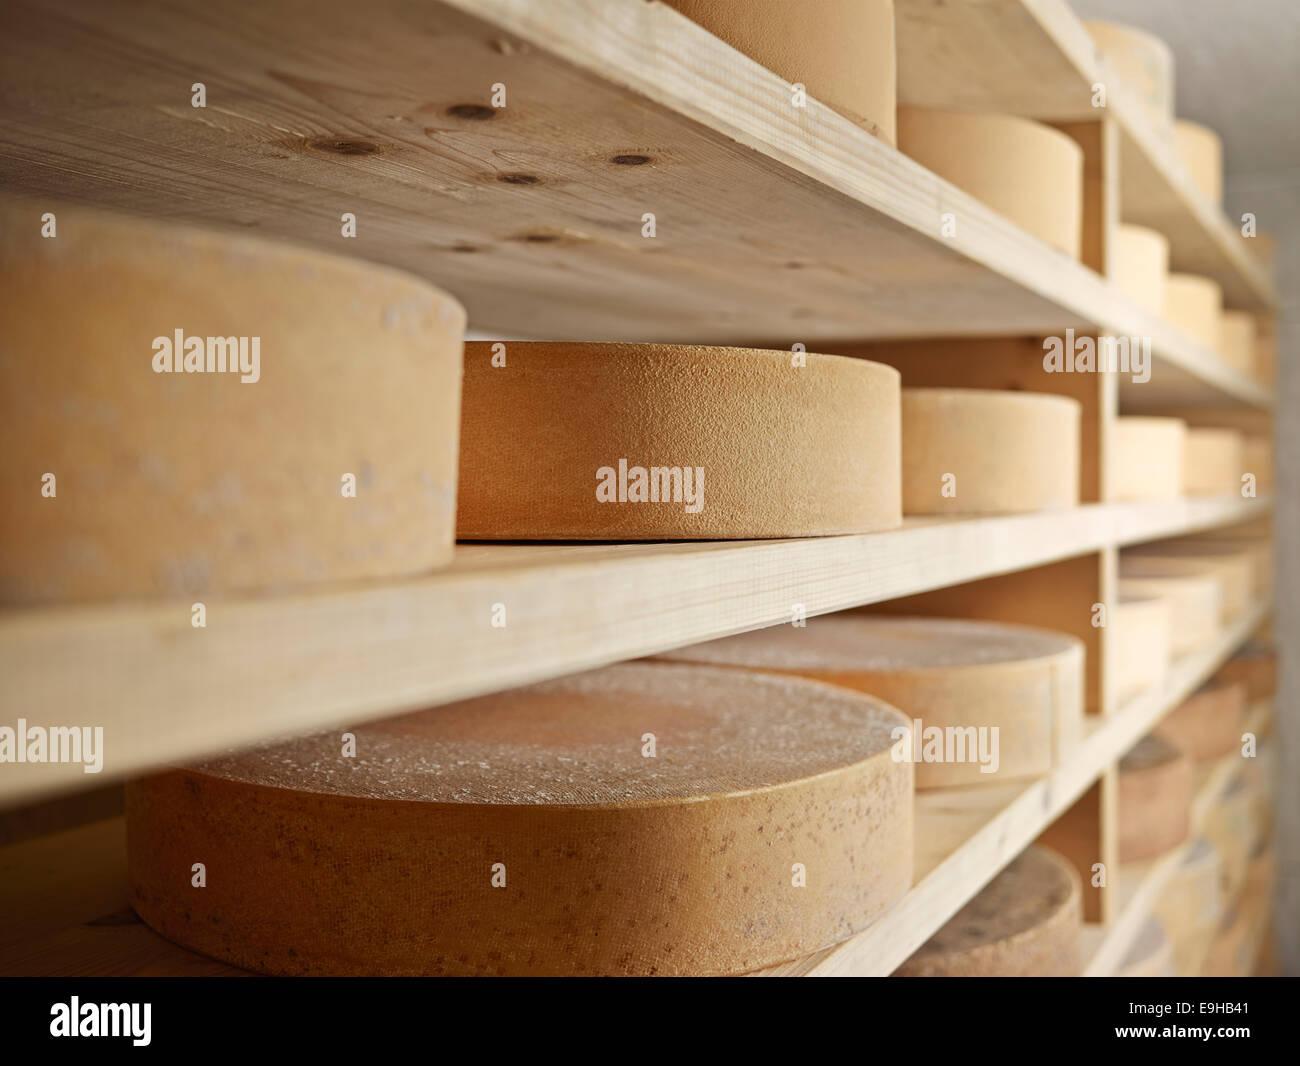 Storing mountain cheese, Steinbergalm, Inneralpbach, Alpbach, Tyrol, Austria - Stock Image